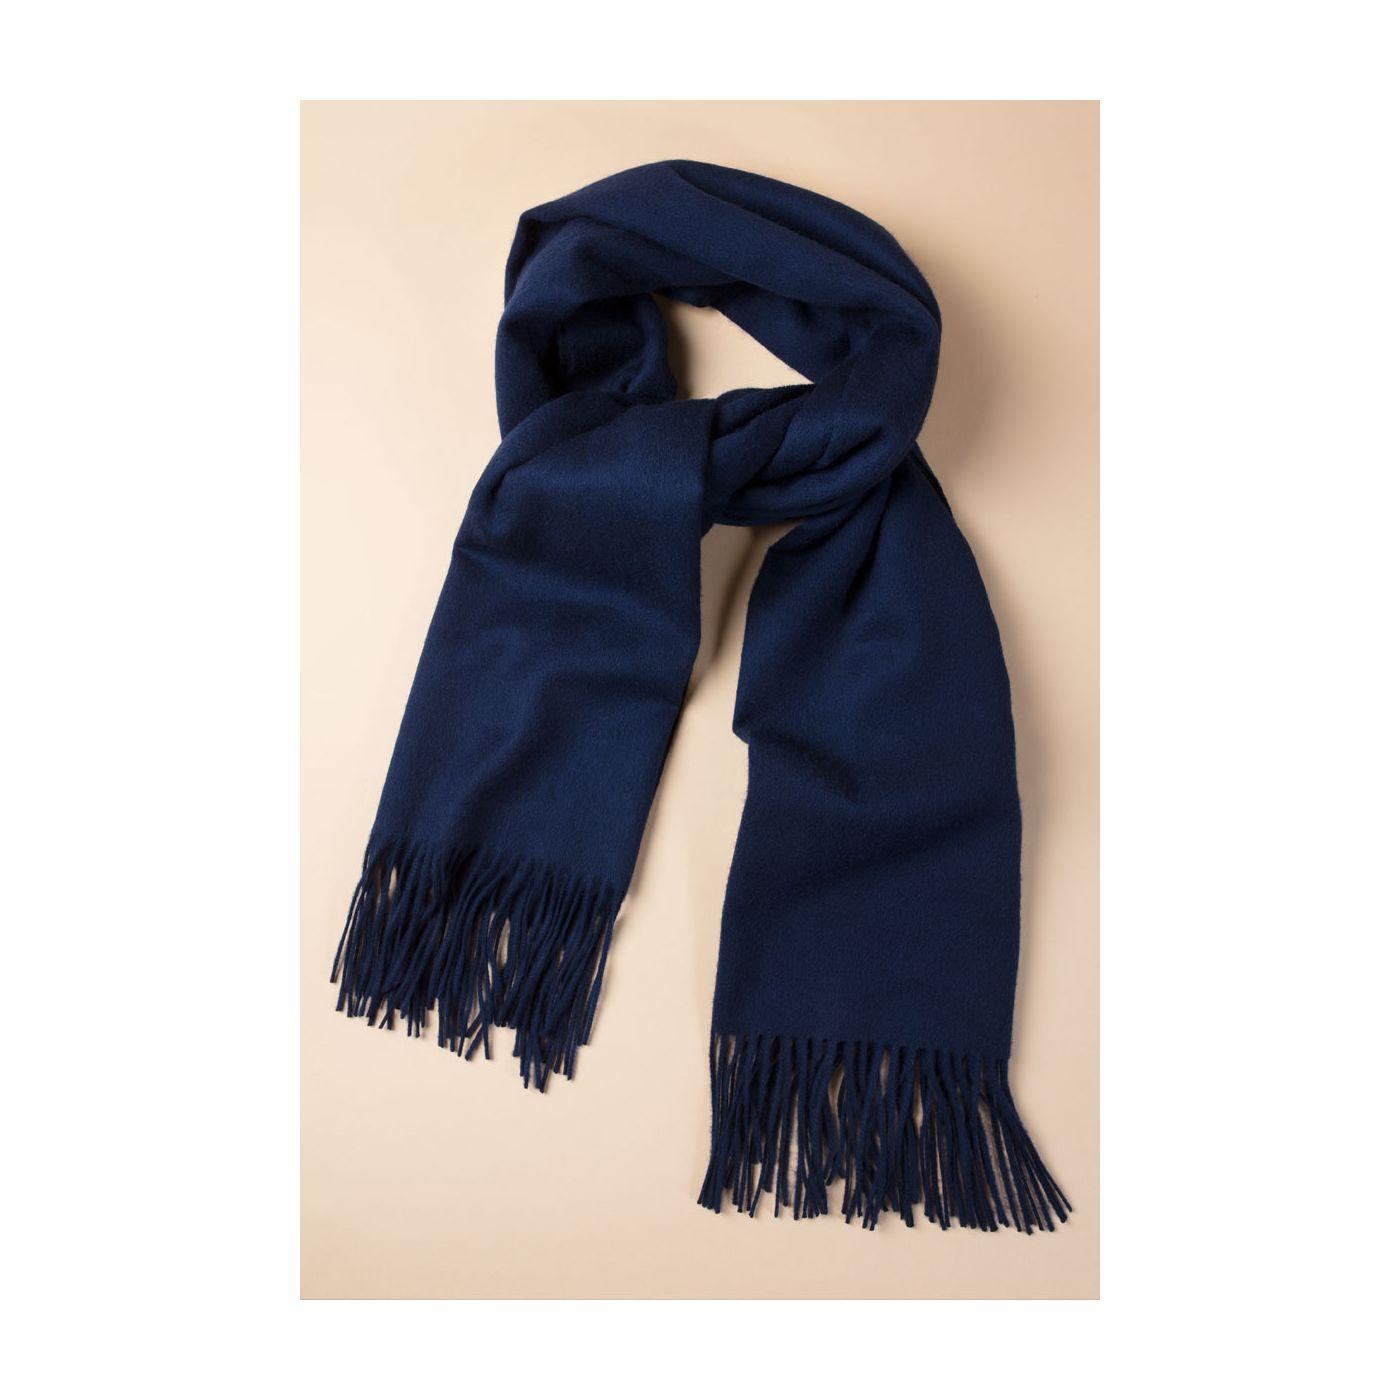 Scarf for men made of Merino wool in Dark blue